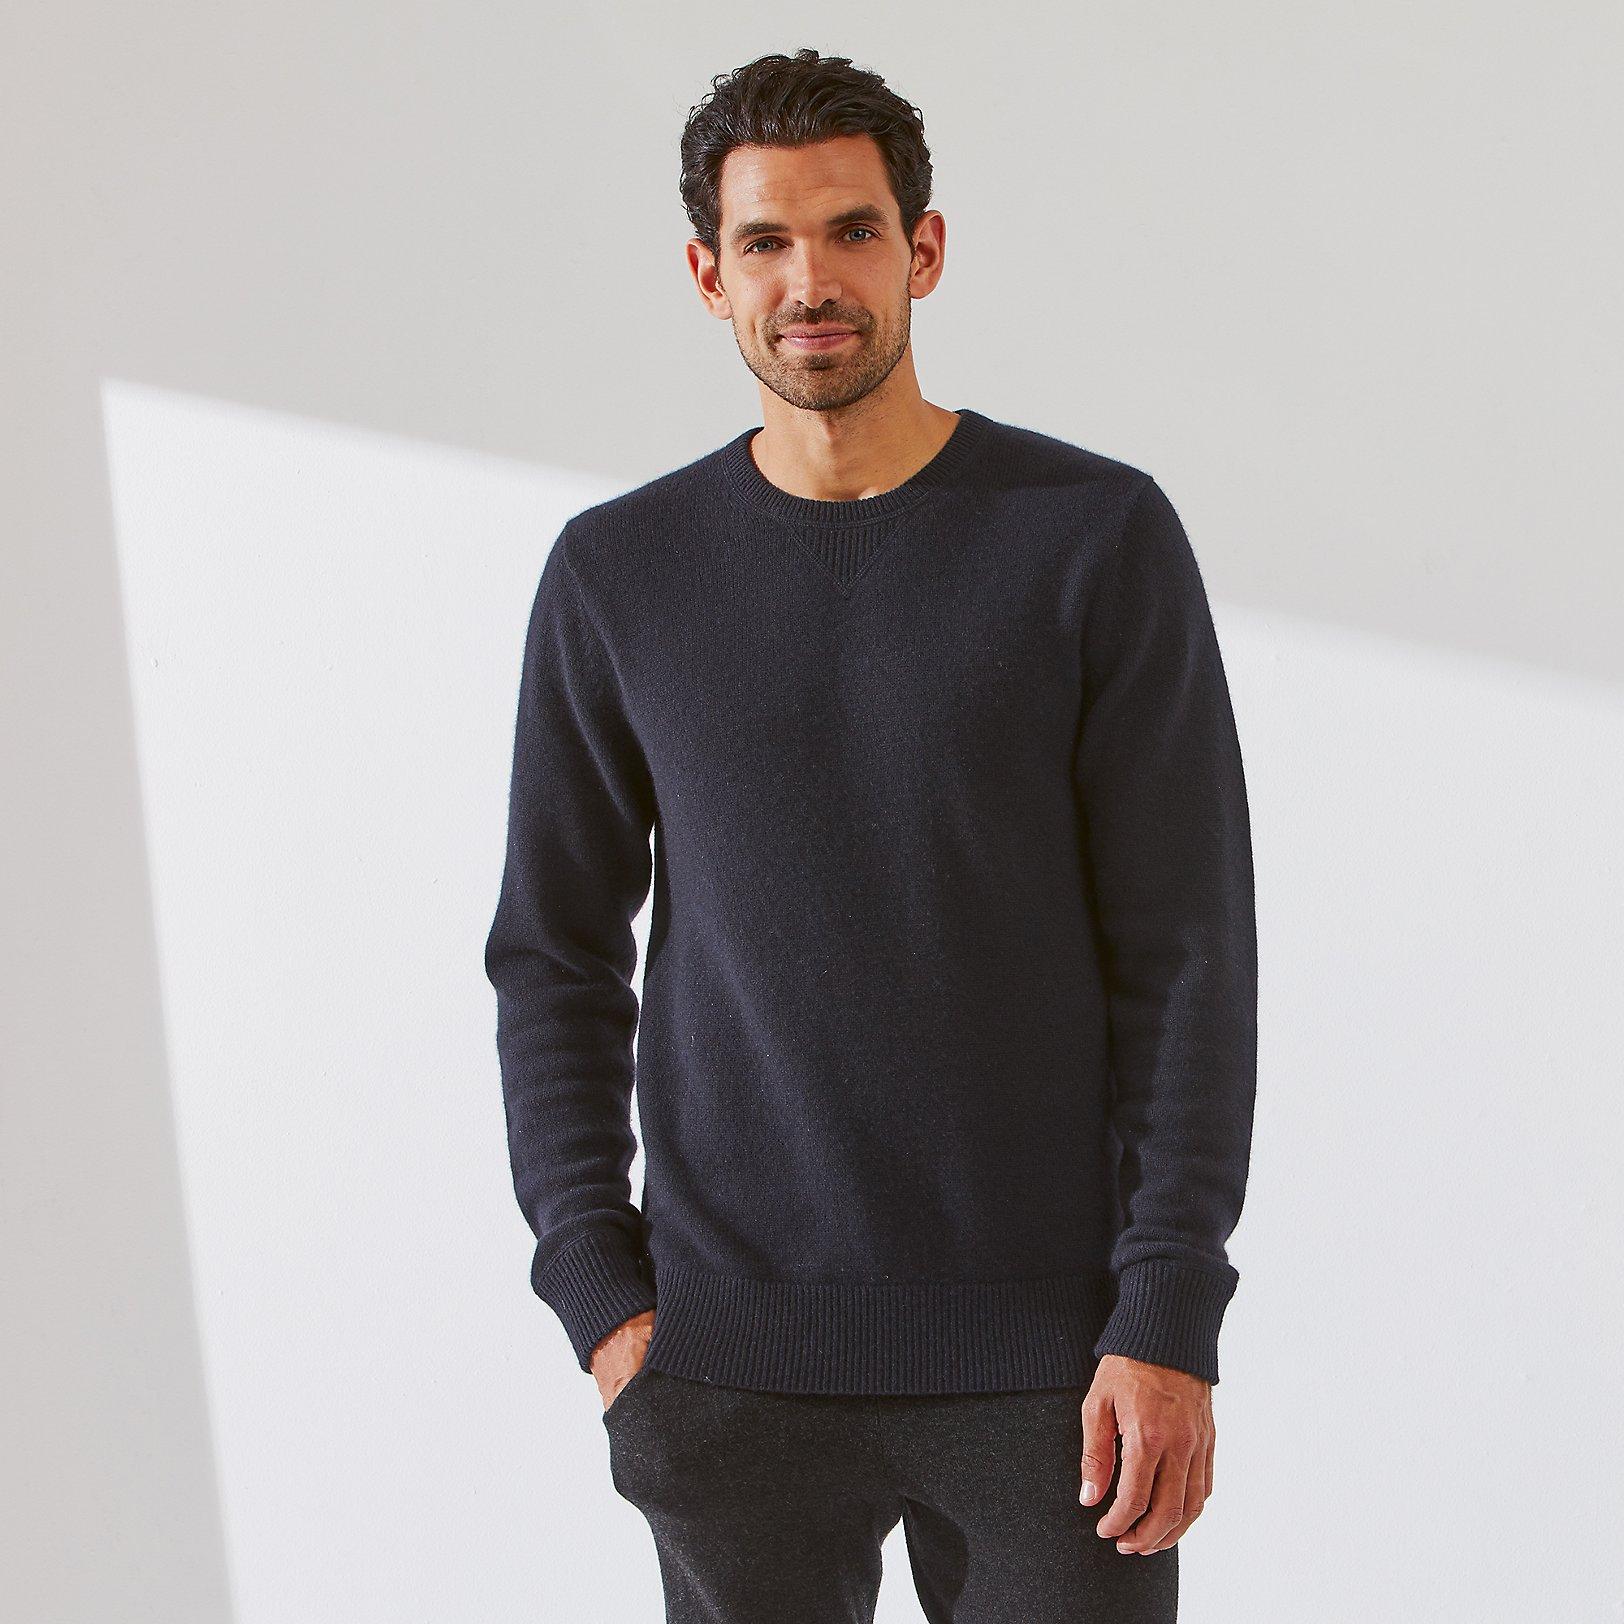 Men's Cashmere Sweater | Sleepwear | The White Company US